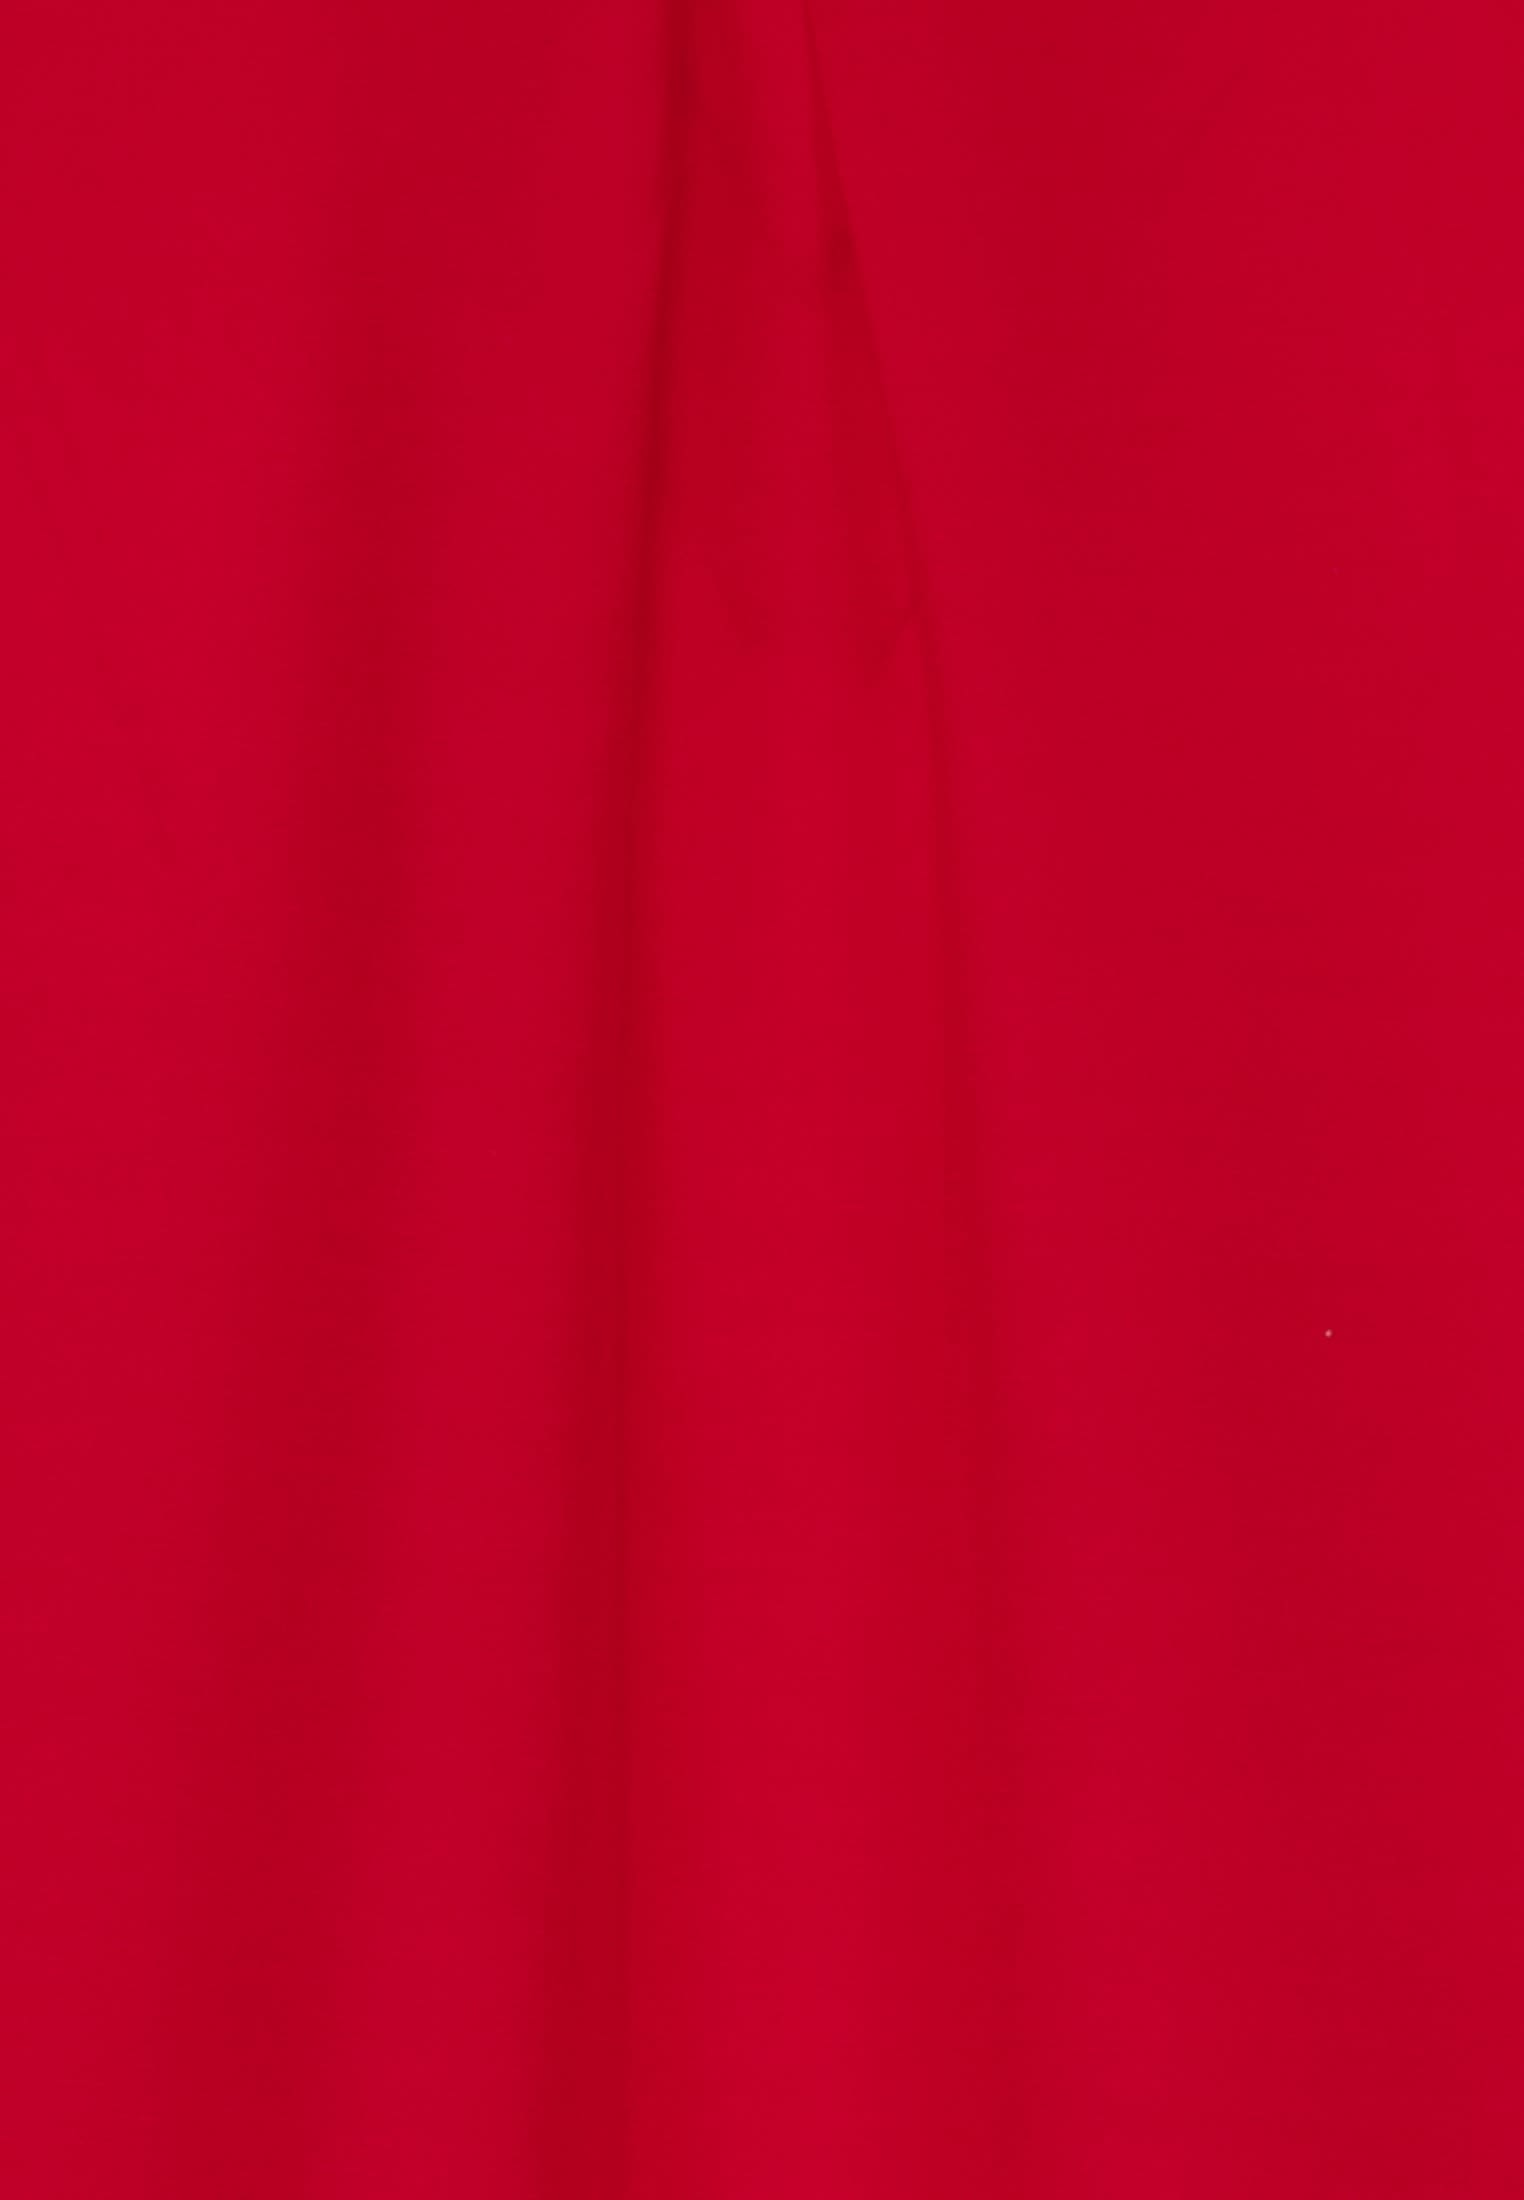 Voile Slip Over Blouse made of 100% Viscose in Red |  Seidensticker Onlineshop